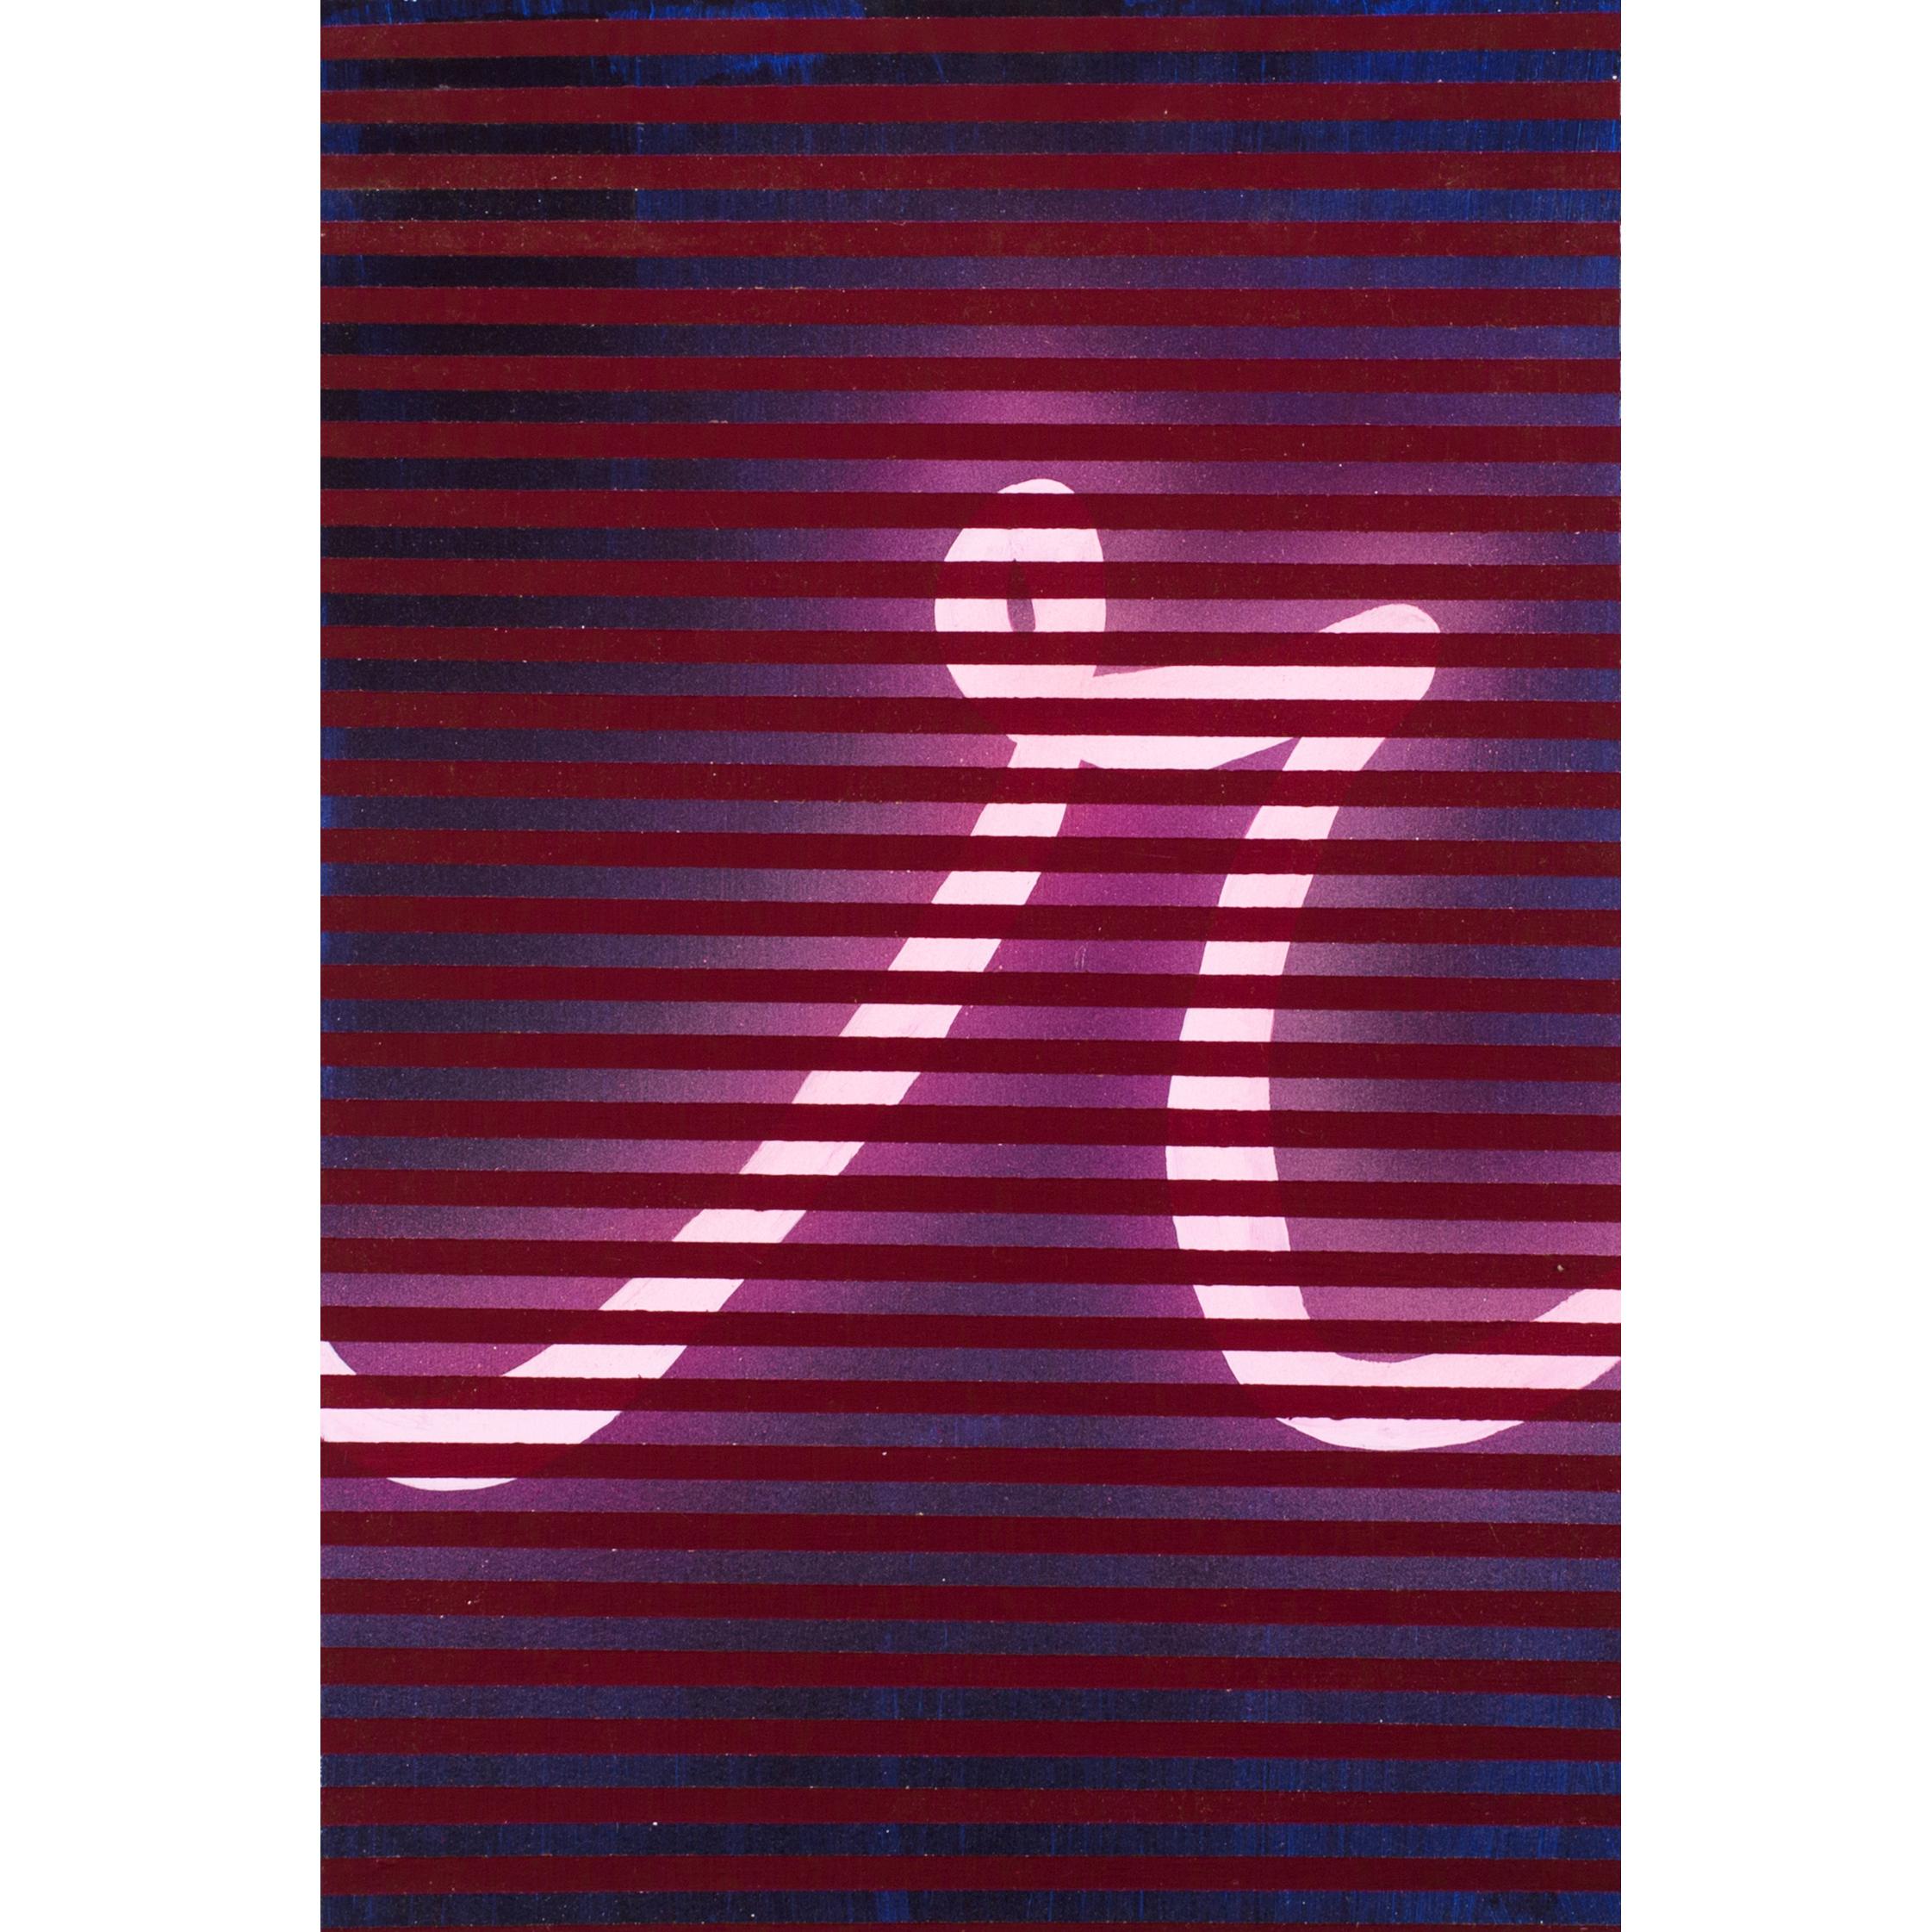 r , 15 x 10 inches, Acrylic on Hand Cut Sheetrock, 2014.